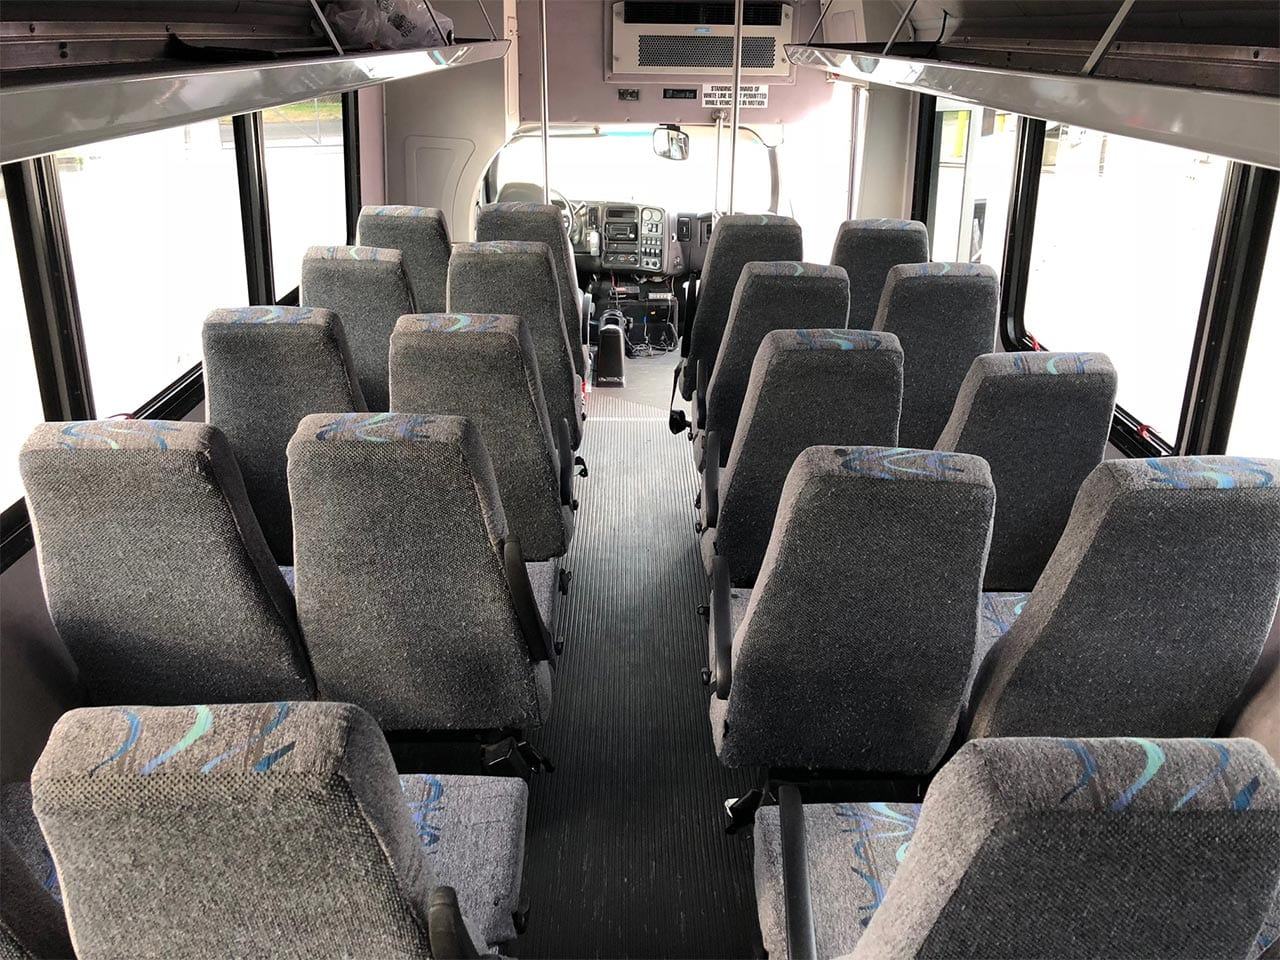 20 passenger Minibus Inside